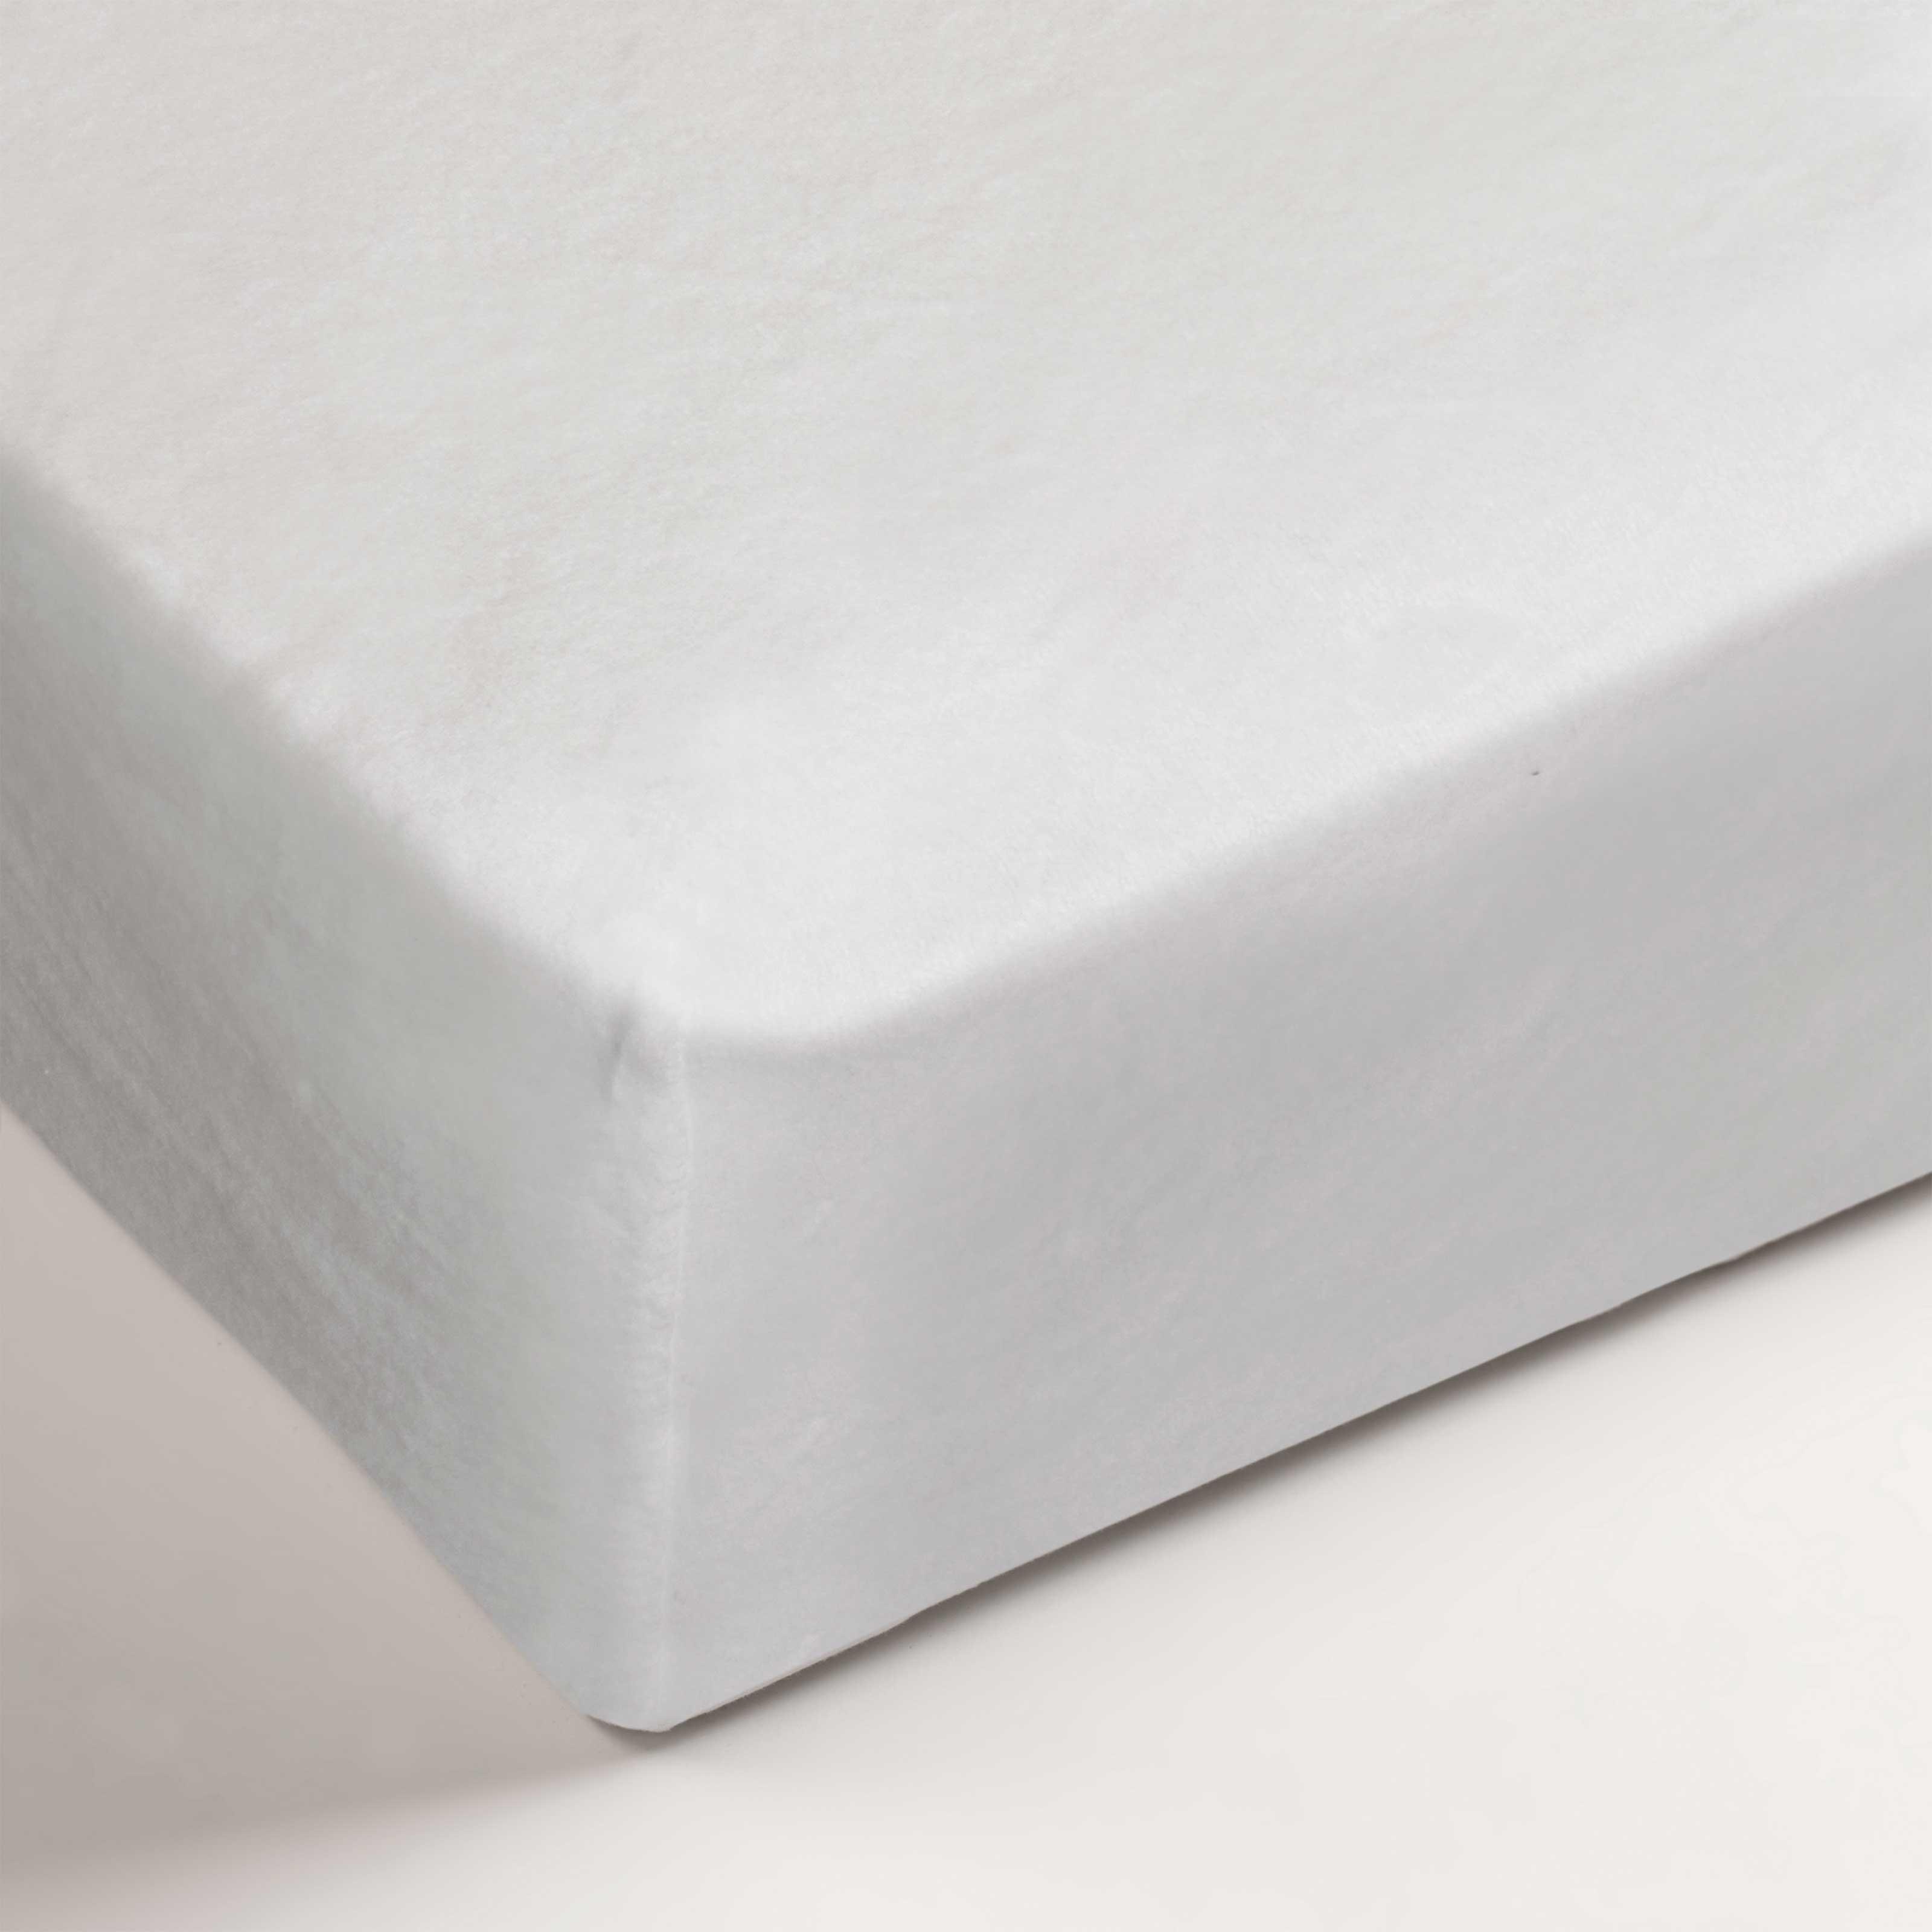 BH molton faconlagen 70/80x200/220x28 hvid thumbnail